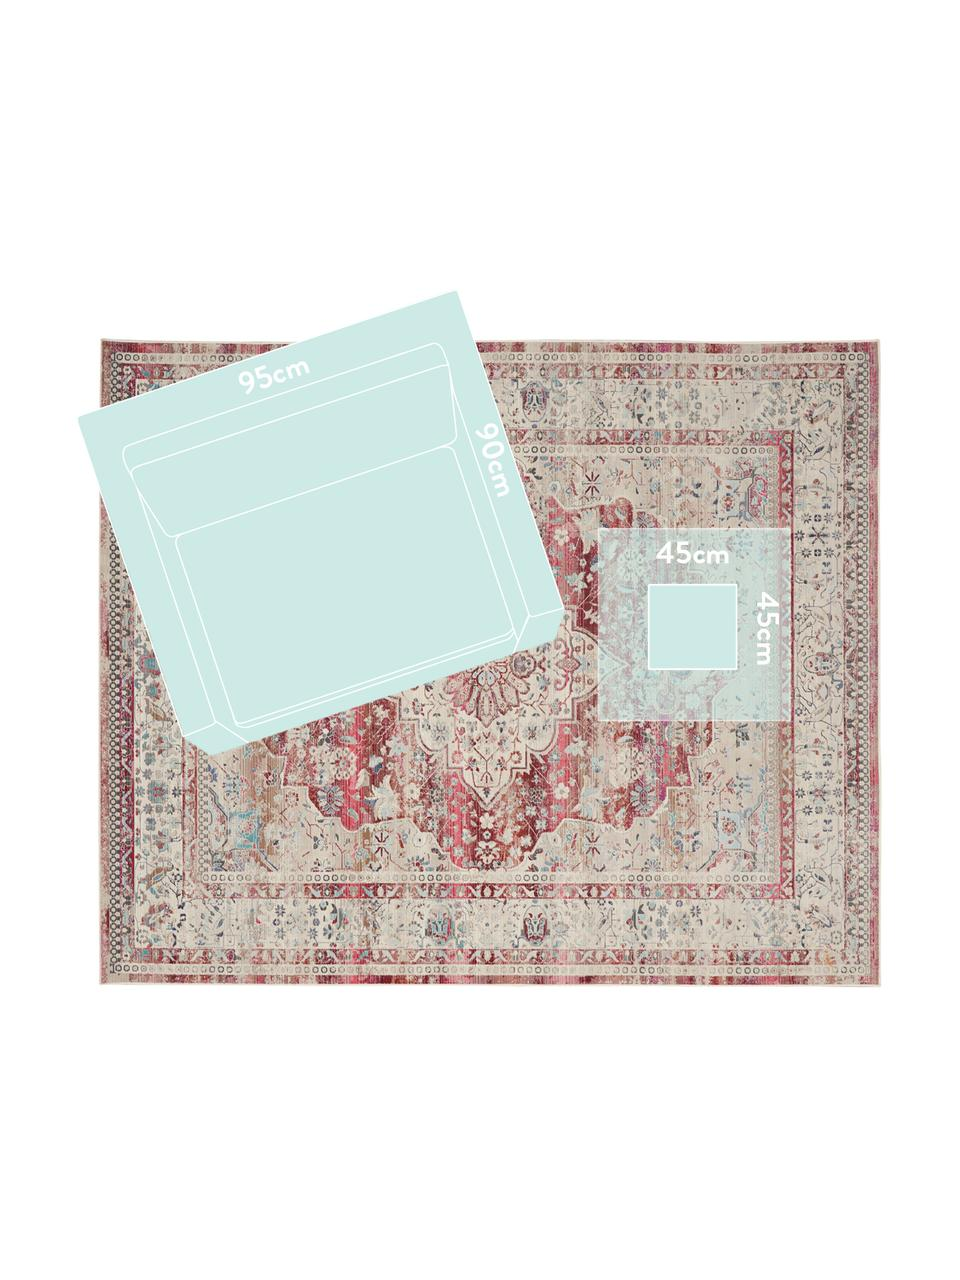 Vloerkleed Vintage Kashan met vintage patroon, Bovenzijde: 100% polypropyleen, Onderzijde: latex, Beige, rood, blauw, B 160 x L 240 cm (maat M)